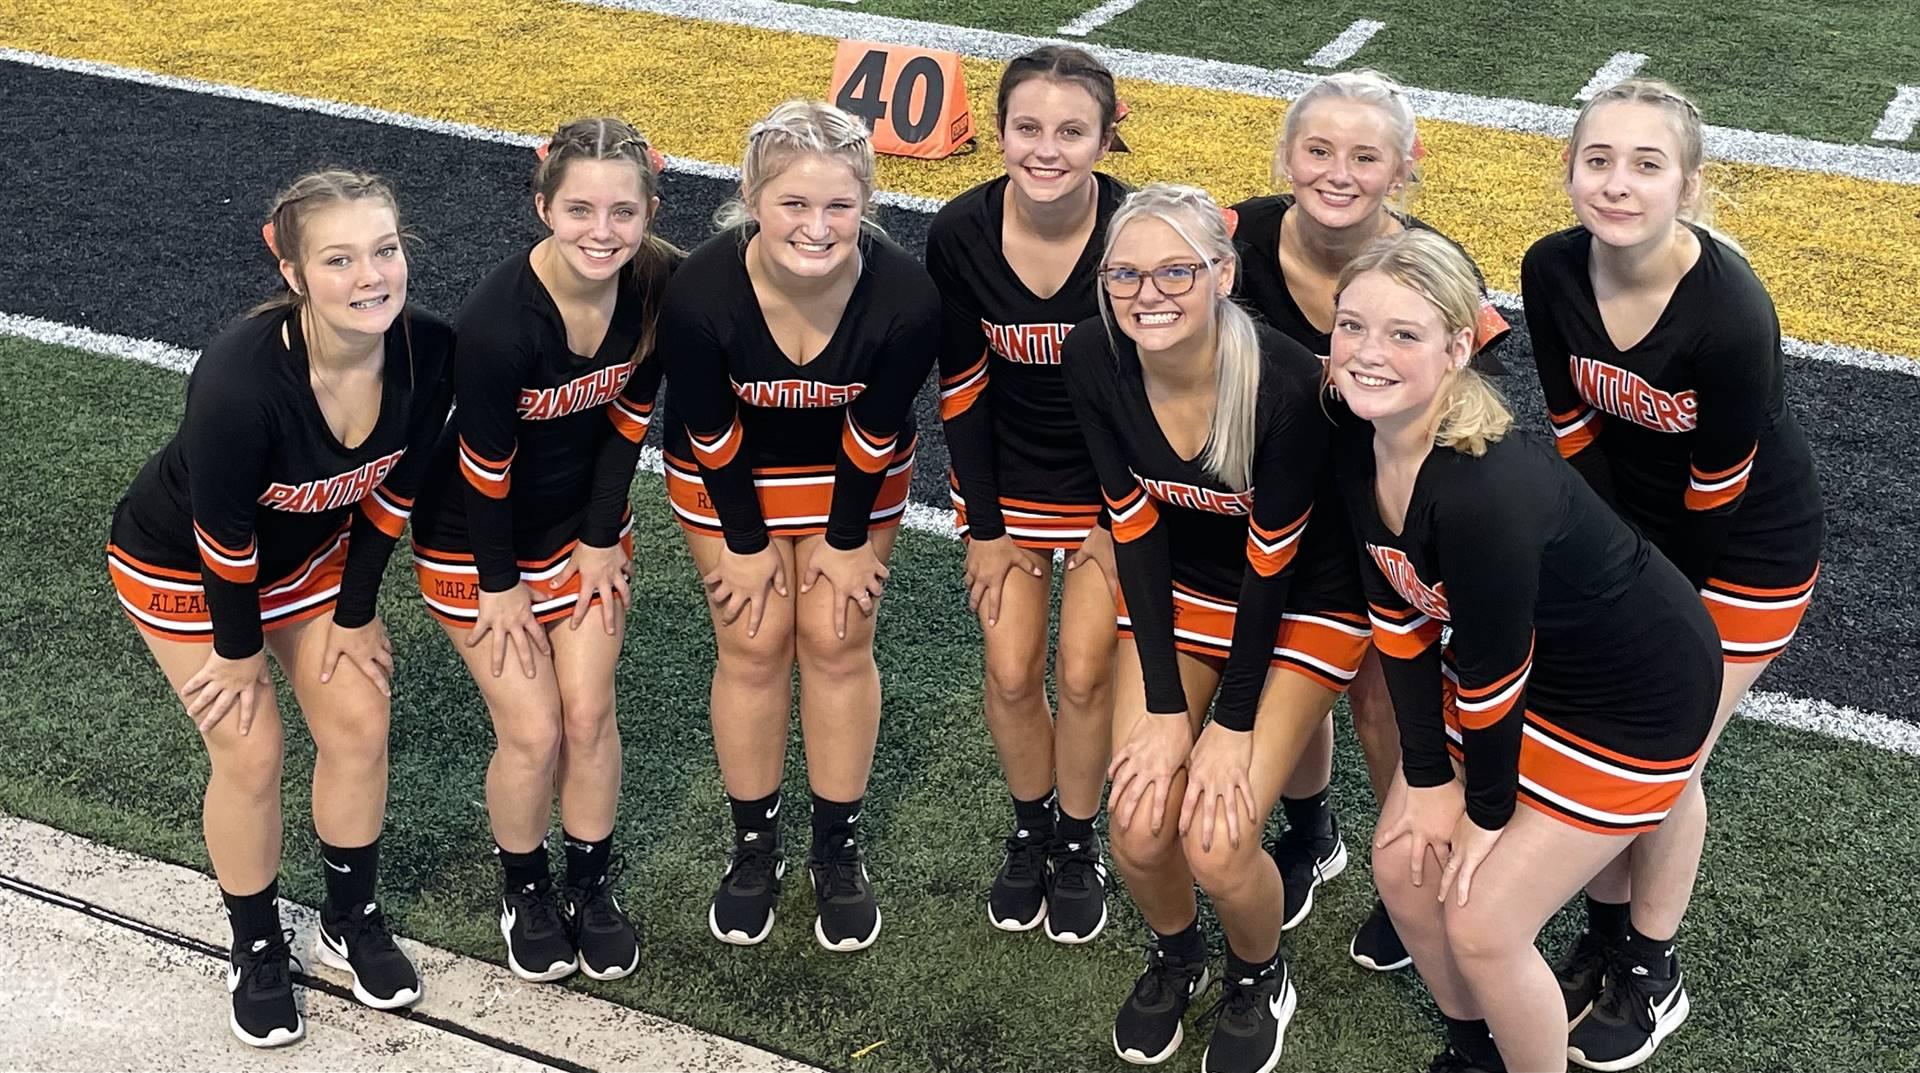 Varsity Cheerleaders at the Tri Valley Game